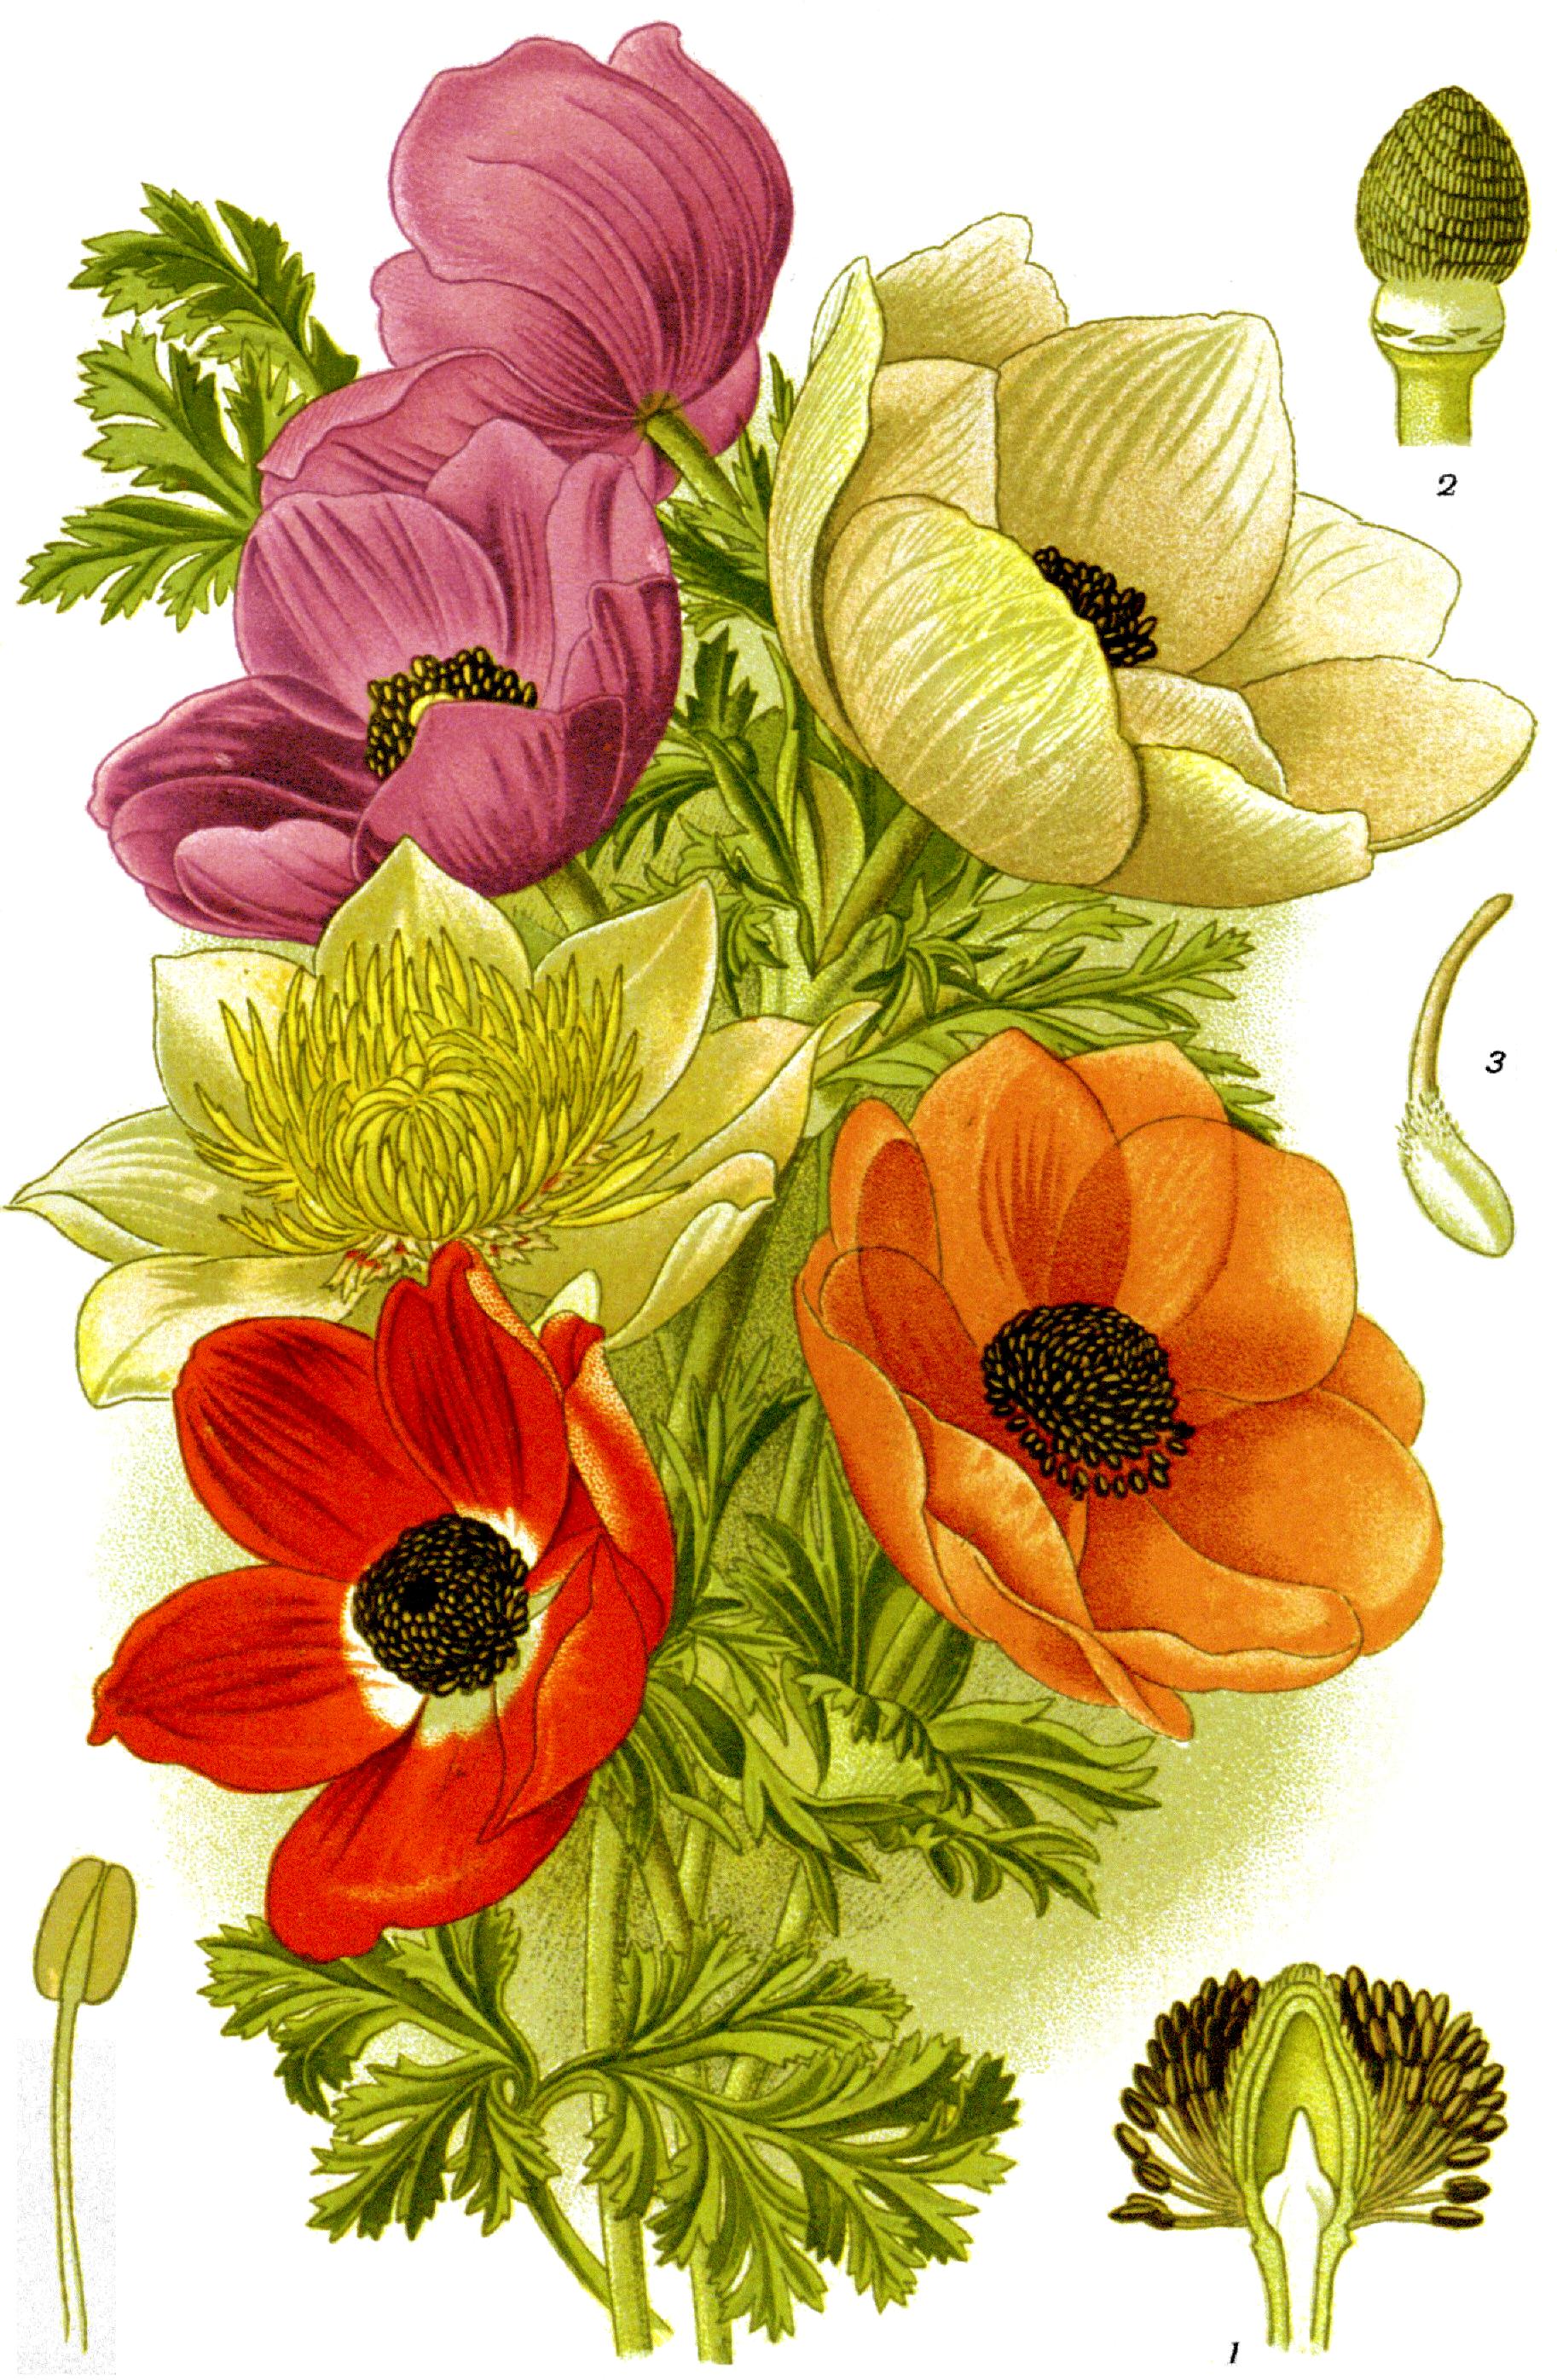 Poppy Anemone Favourite Flowers Garden Greenhouse 1 0021 3g